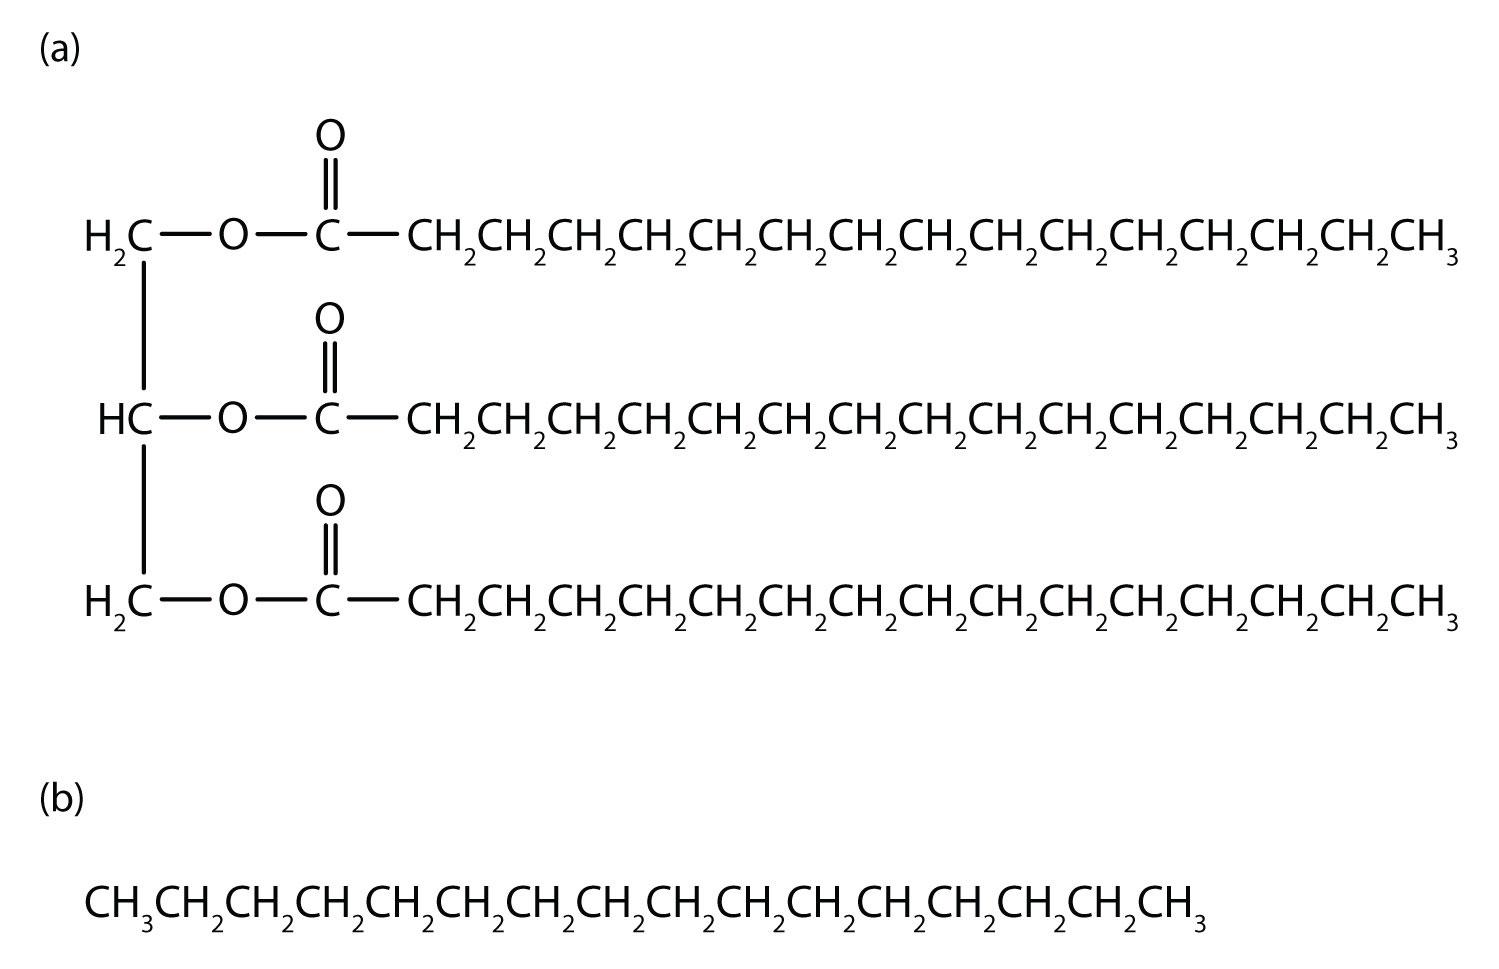 Tripalmitin (a), a typical fat molecule, has long hydrocarbon chains ...